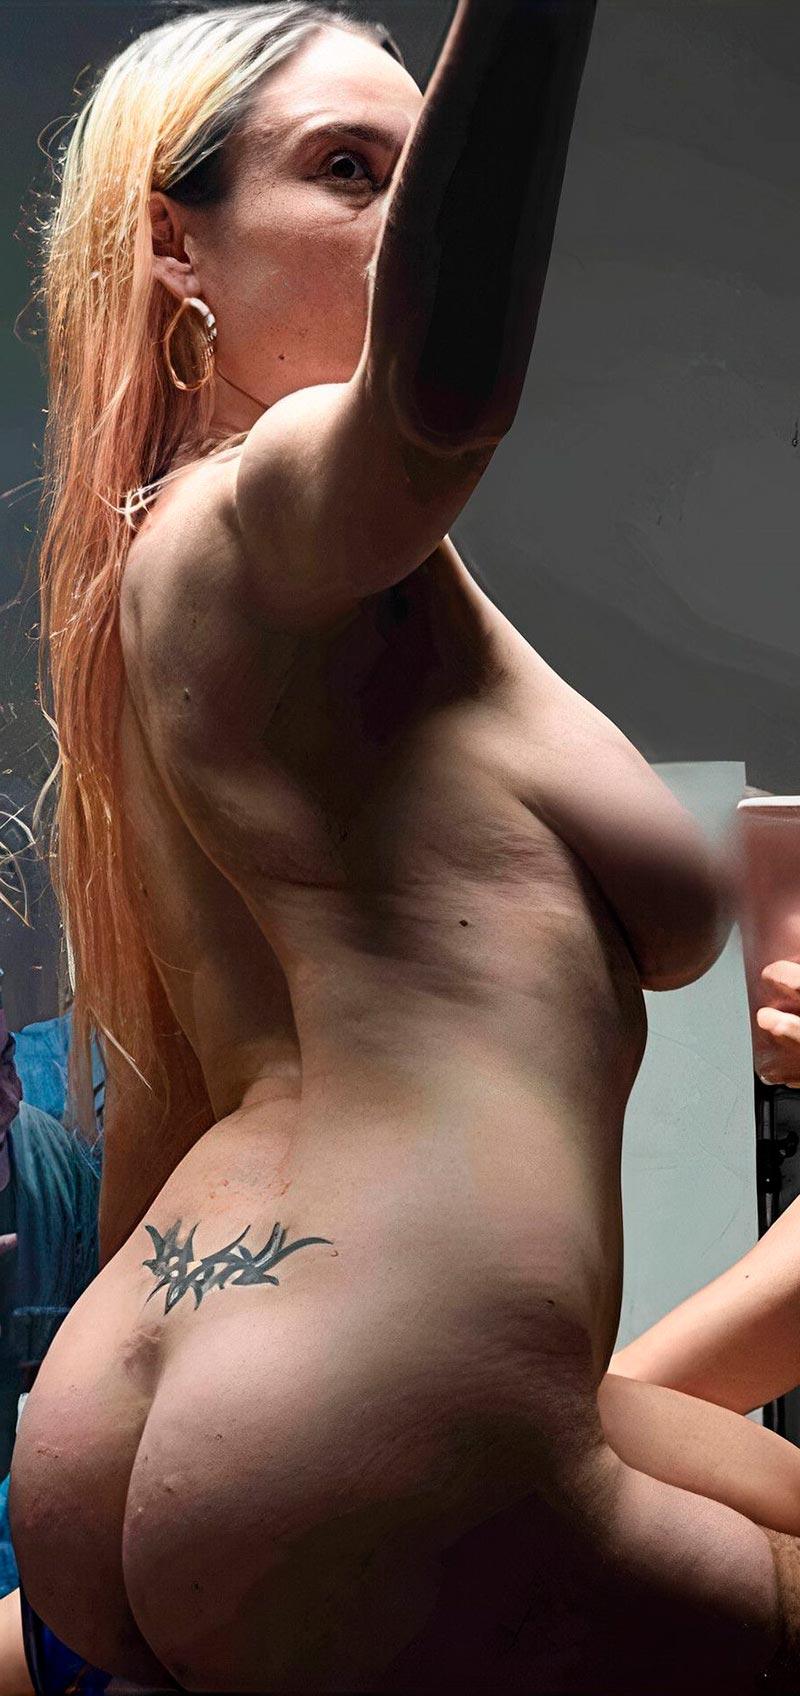 María Forqué Onlyfayer Contenido Sexual Subido